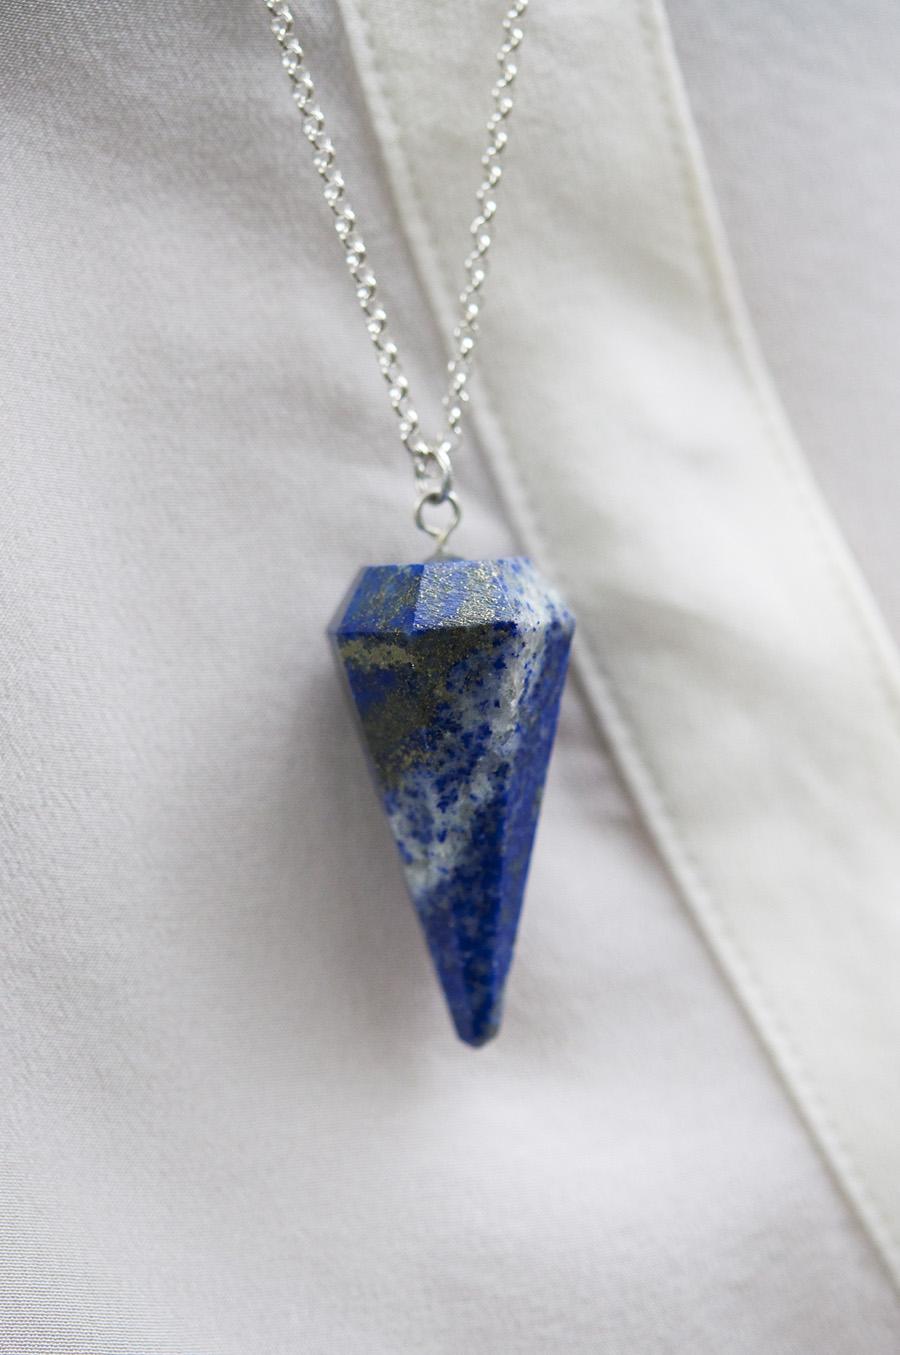 bd6cf-bluependulumnecklace.jpg